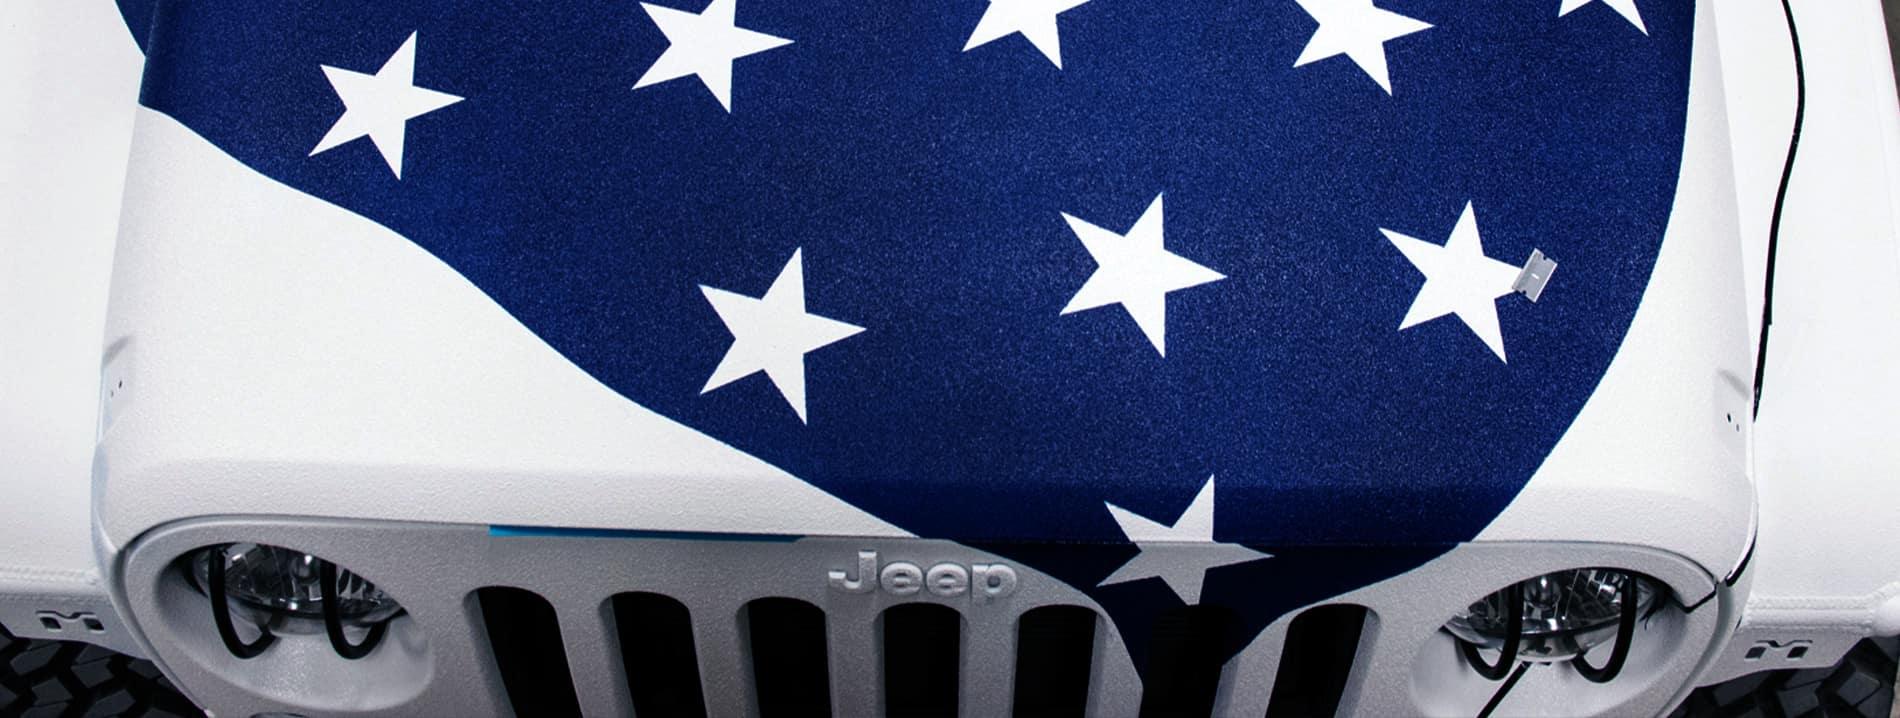 Starwood Jeep Paint